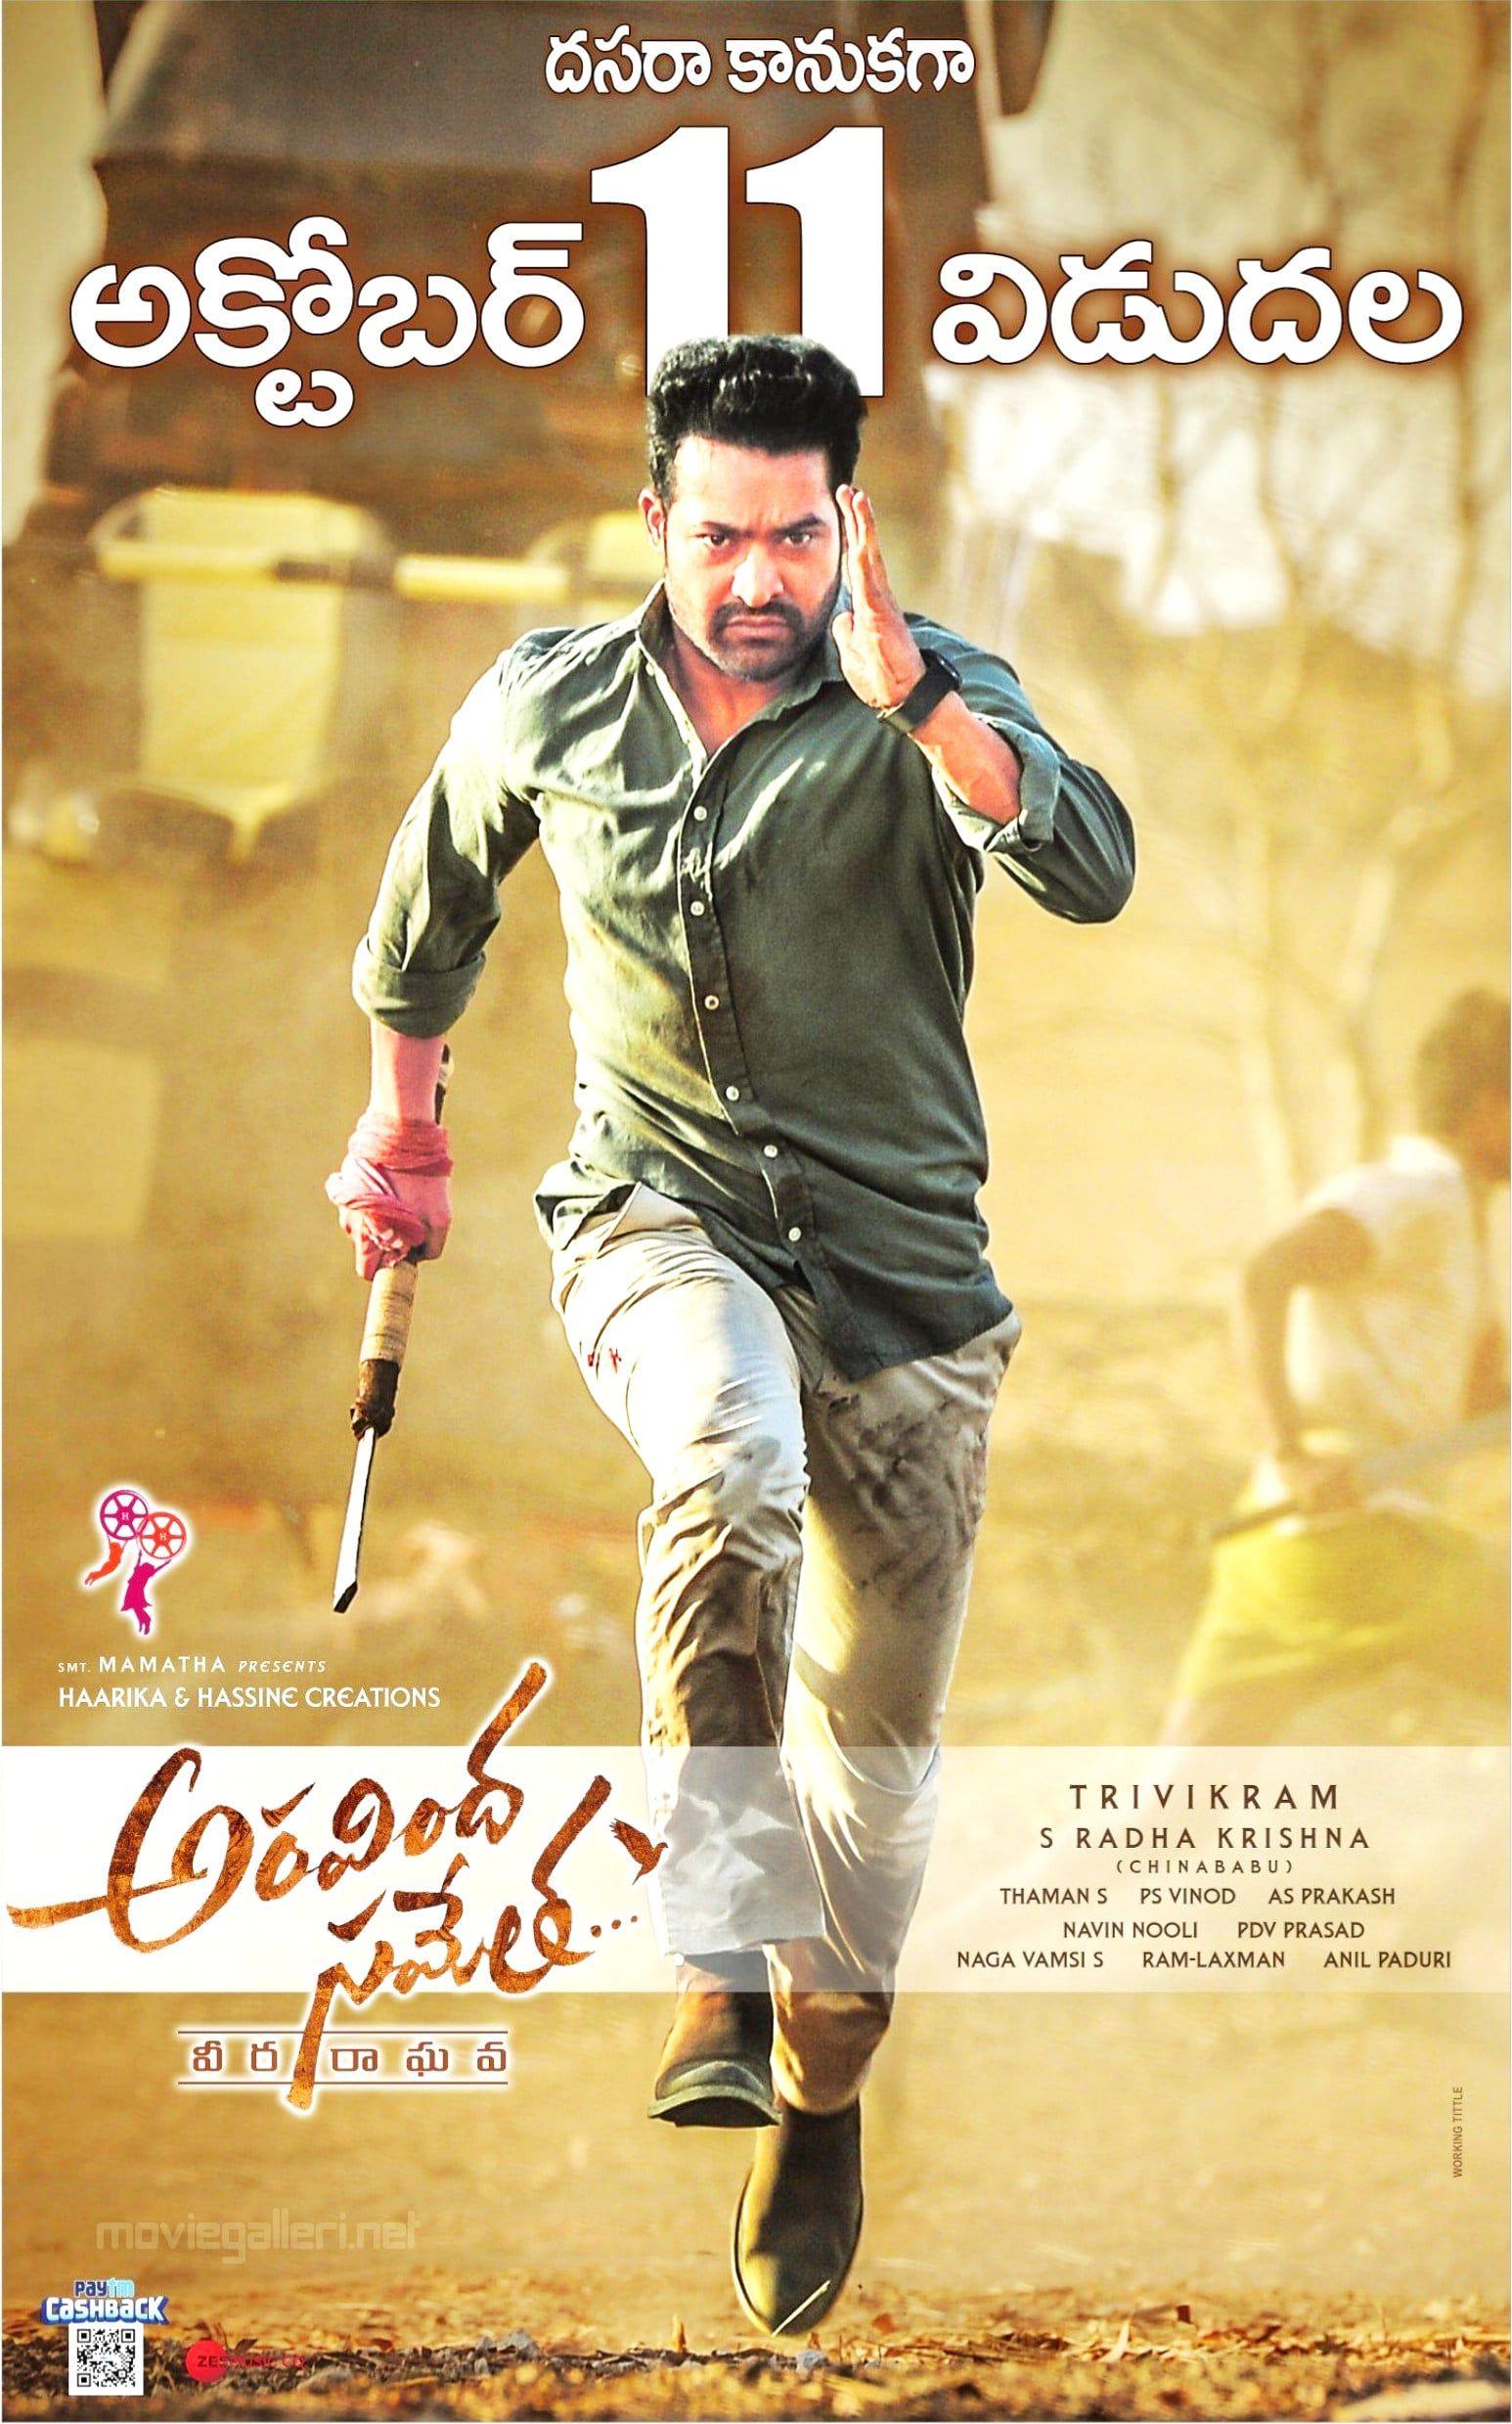 Ver Aravindha Sametha 2018 Pelicula Completa Online En Espanol Latino Subtitulado Aravindhasametha Indian Action Movies Full Movies Telugu Movies Online